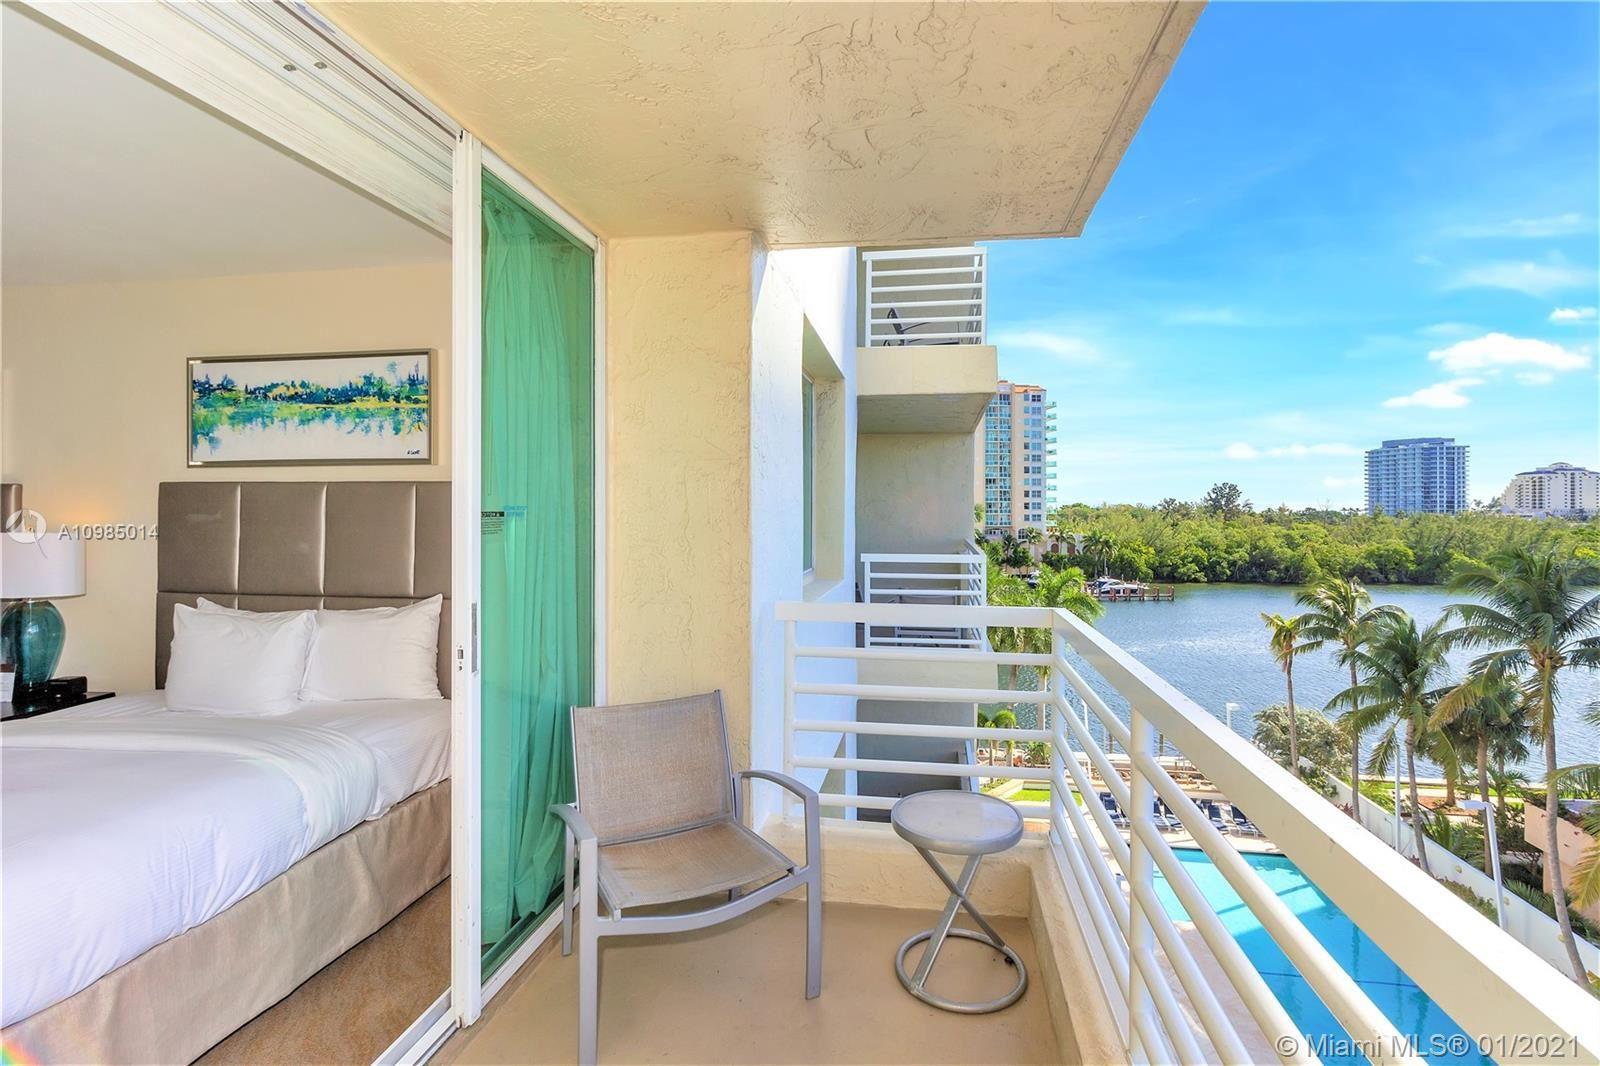 2670 E Sunrise Blvd #509, Fort Lauderdale, FL 33304 - #: A10985014